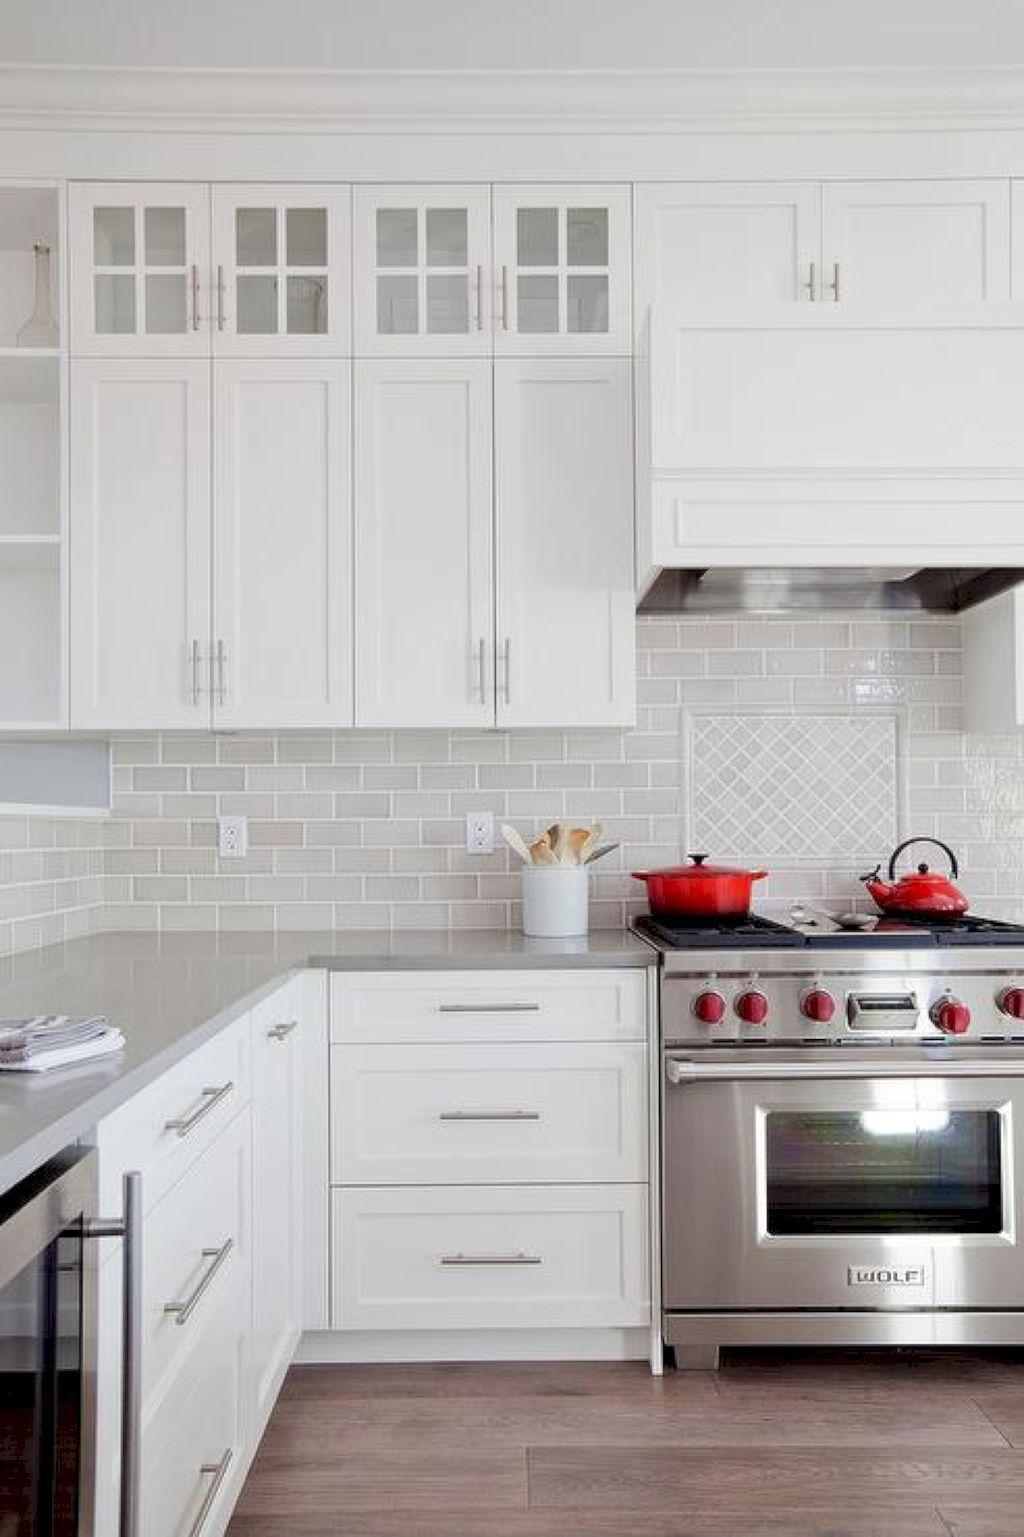 Pin by jennifer michael on dream home pinterest kitchens house